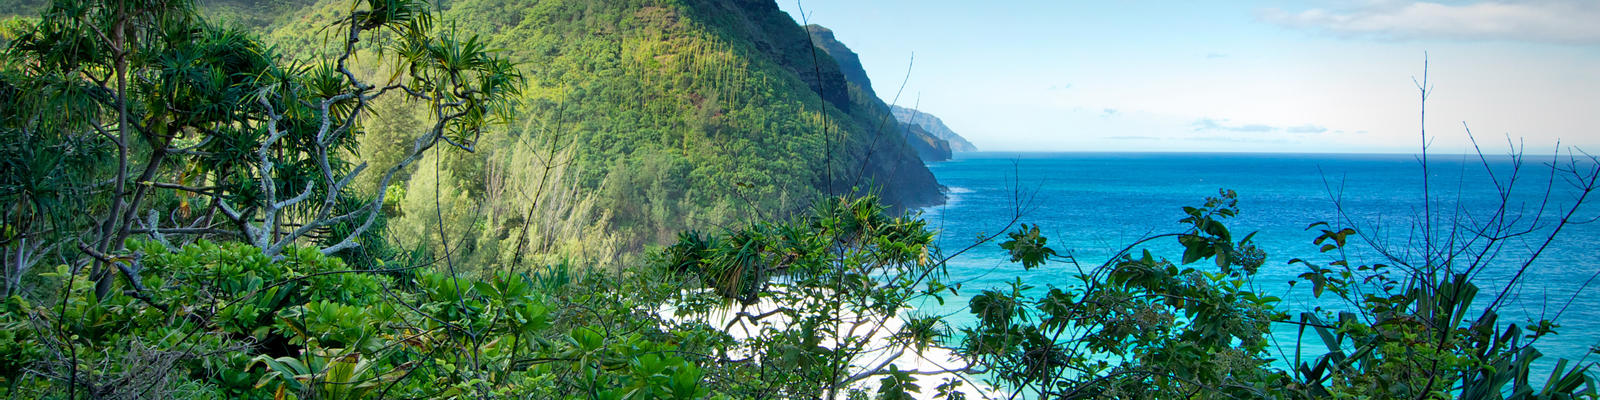 Na Pali Coast, Hawaii (Photo:  Kimberly Shavender/Shutterstock)